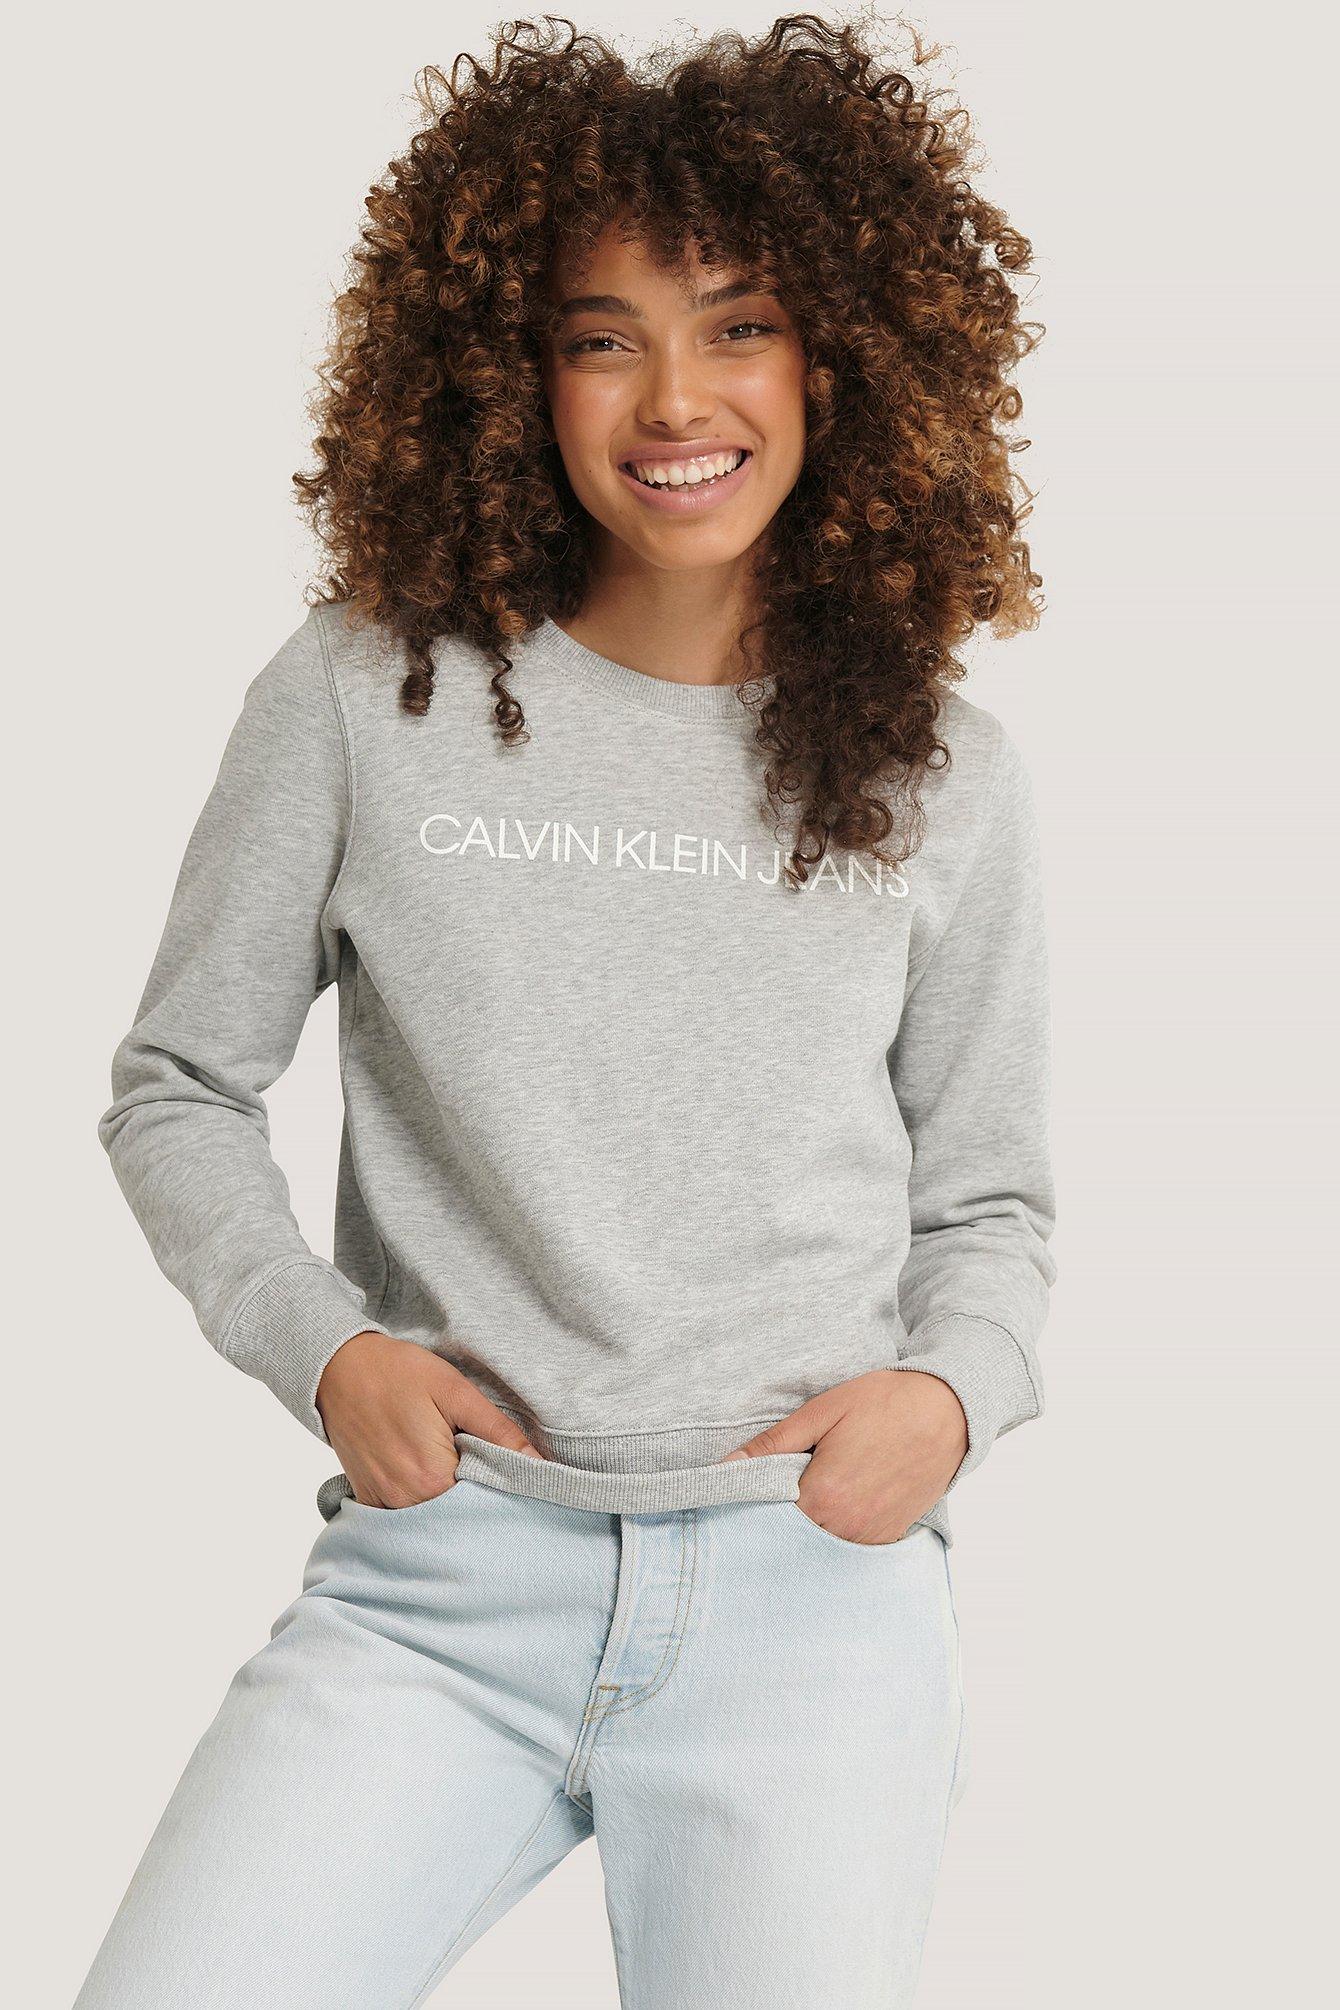 calvin klein -  Institutional Core Logo Sweater - Grey